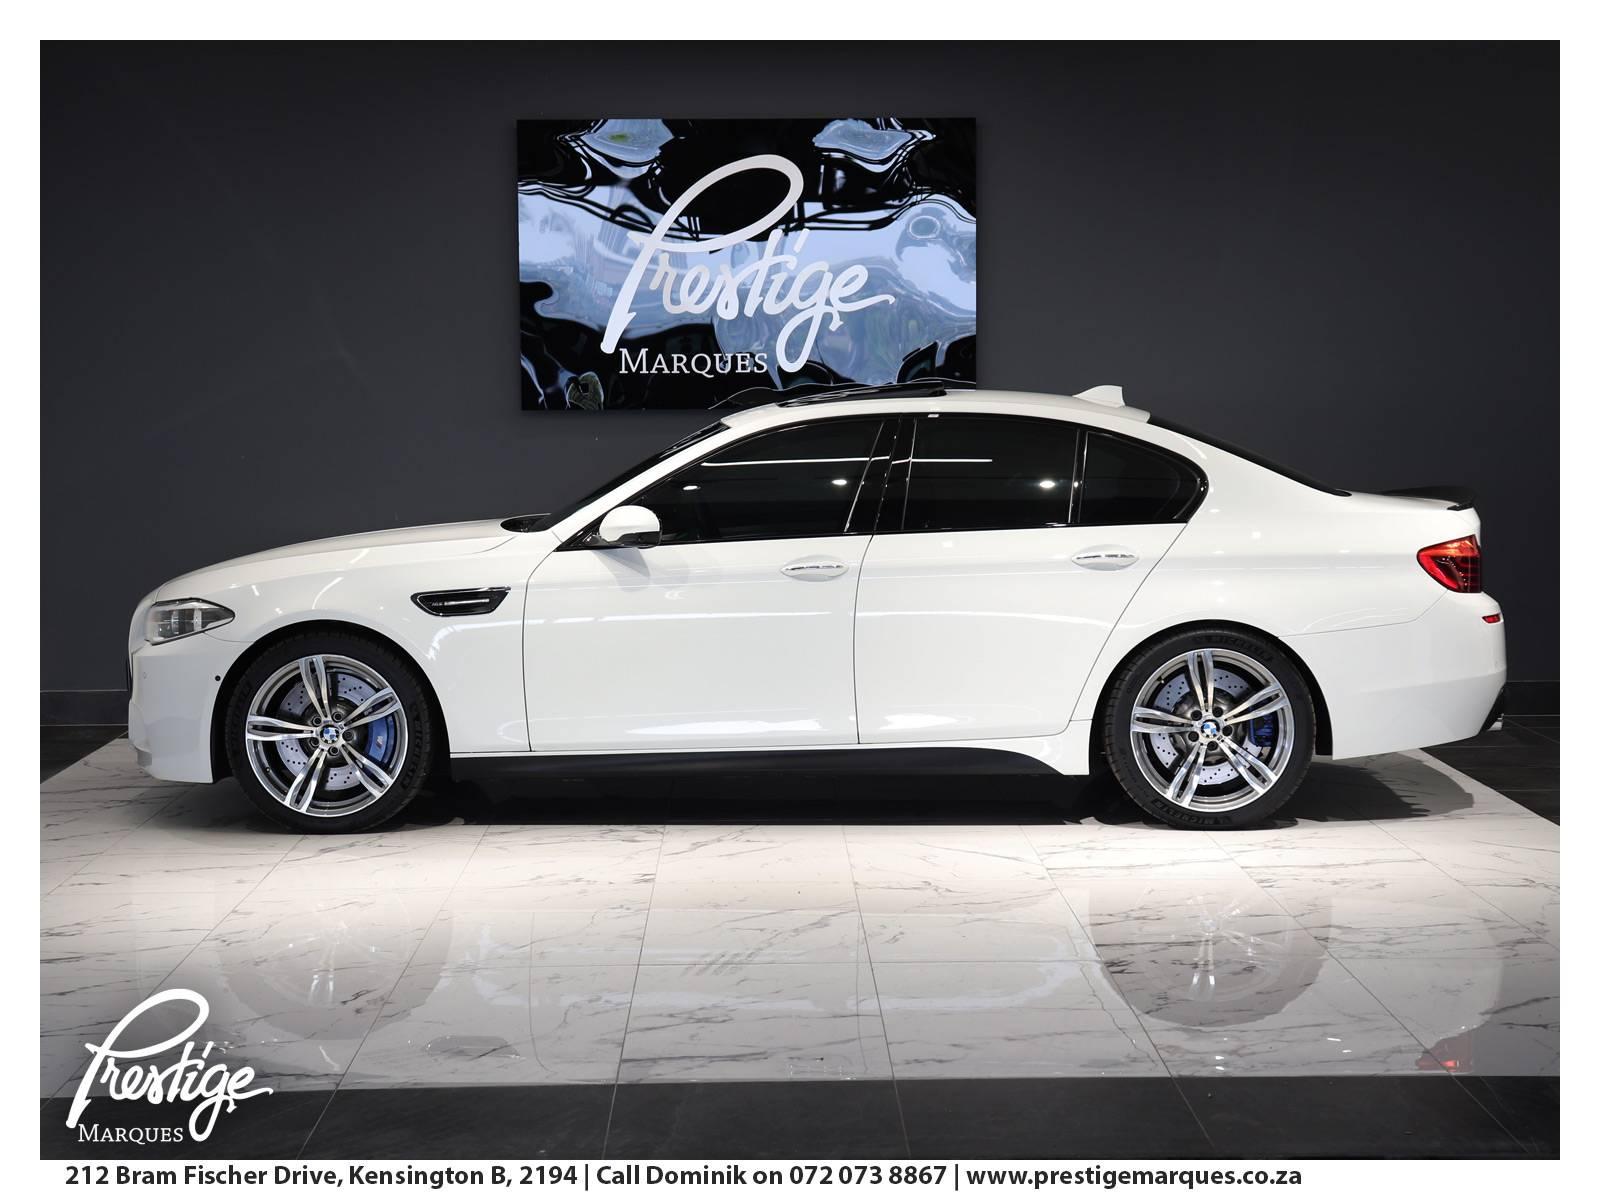 2015-BMW-F10-M5-MDCT-Prestige-Marques-Randburg-Sandton-5